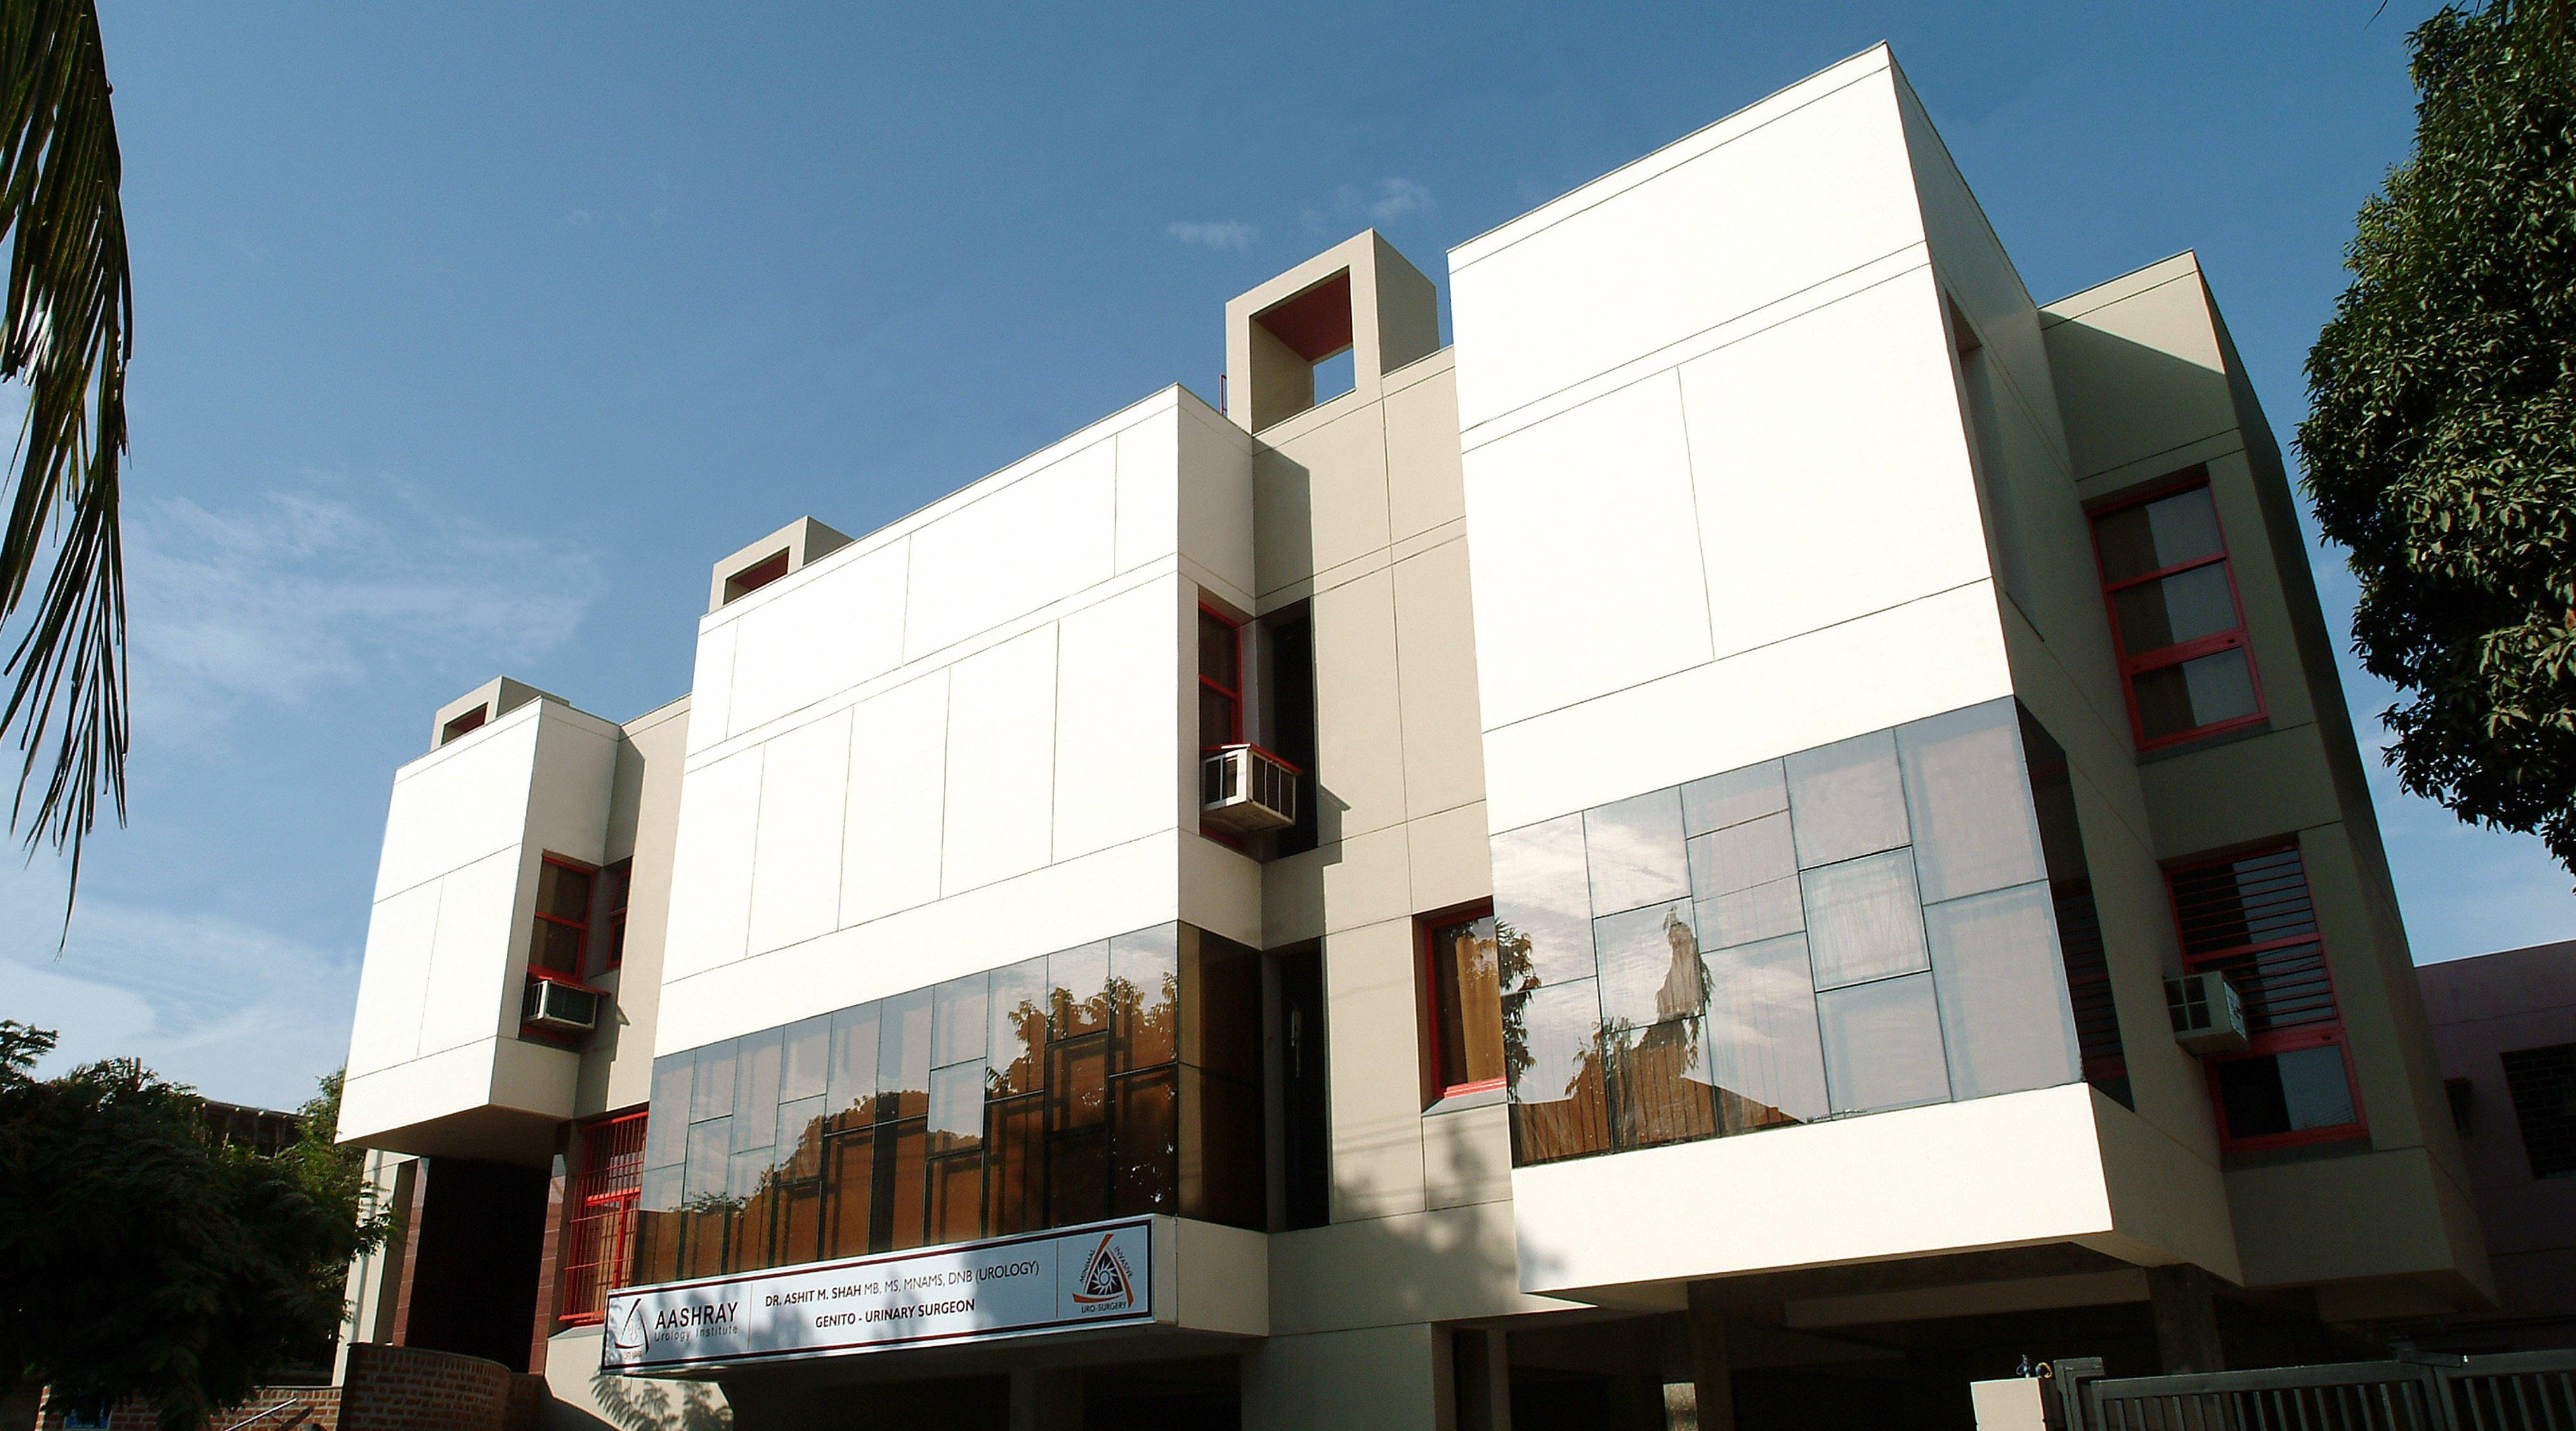 Aashray Urology Institute